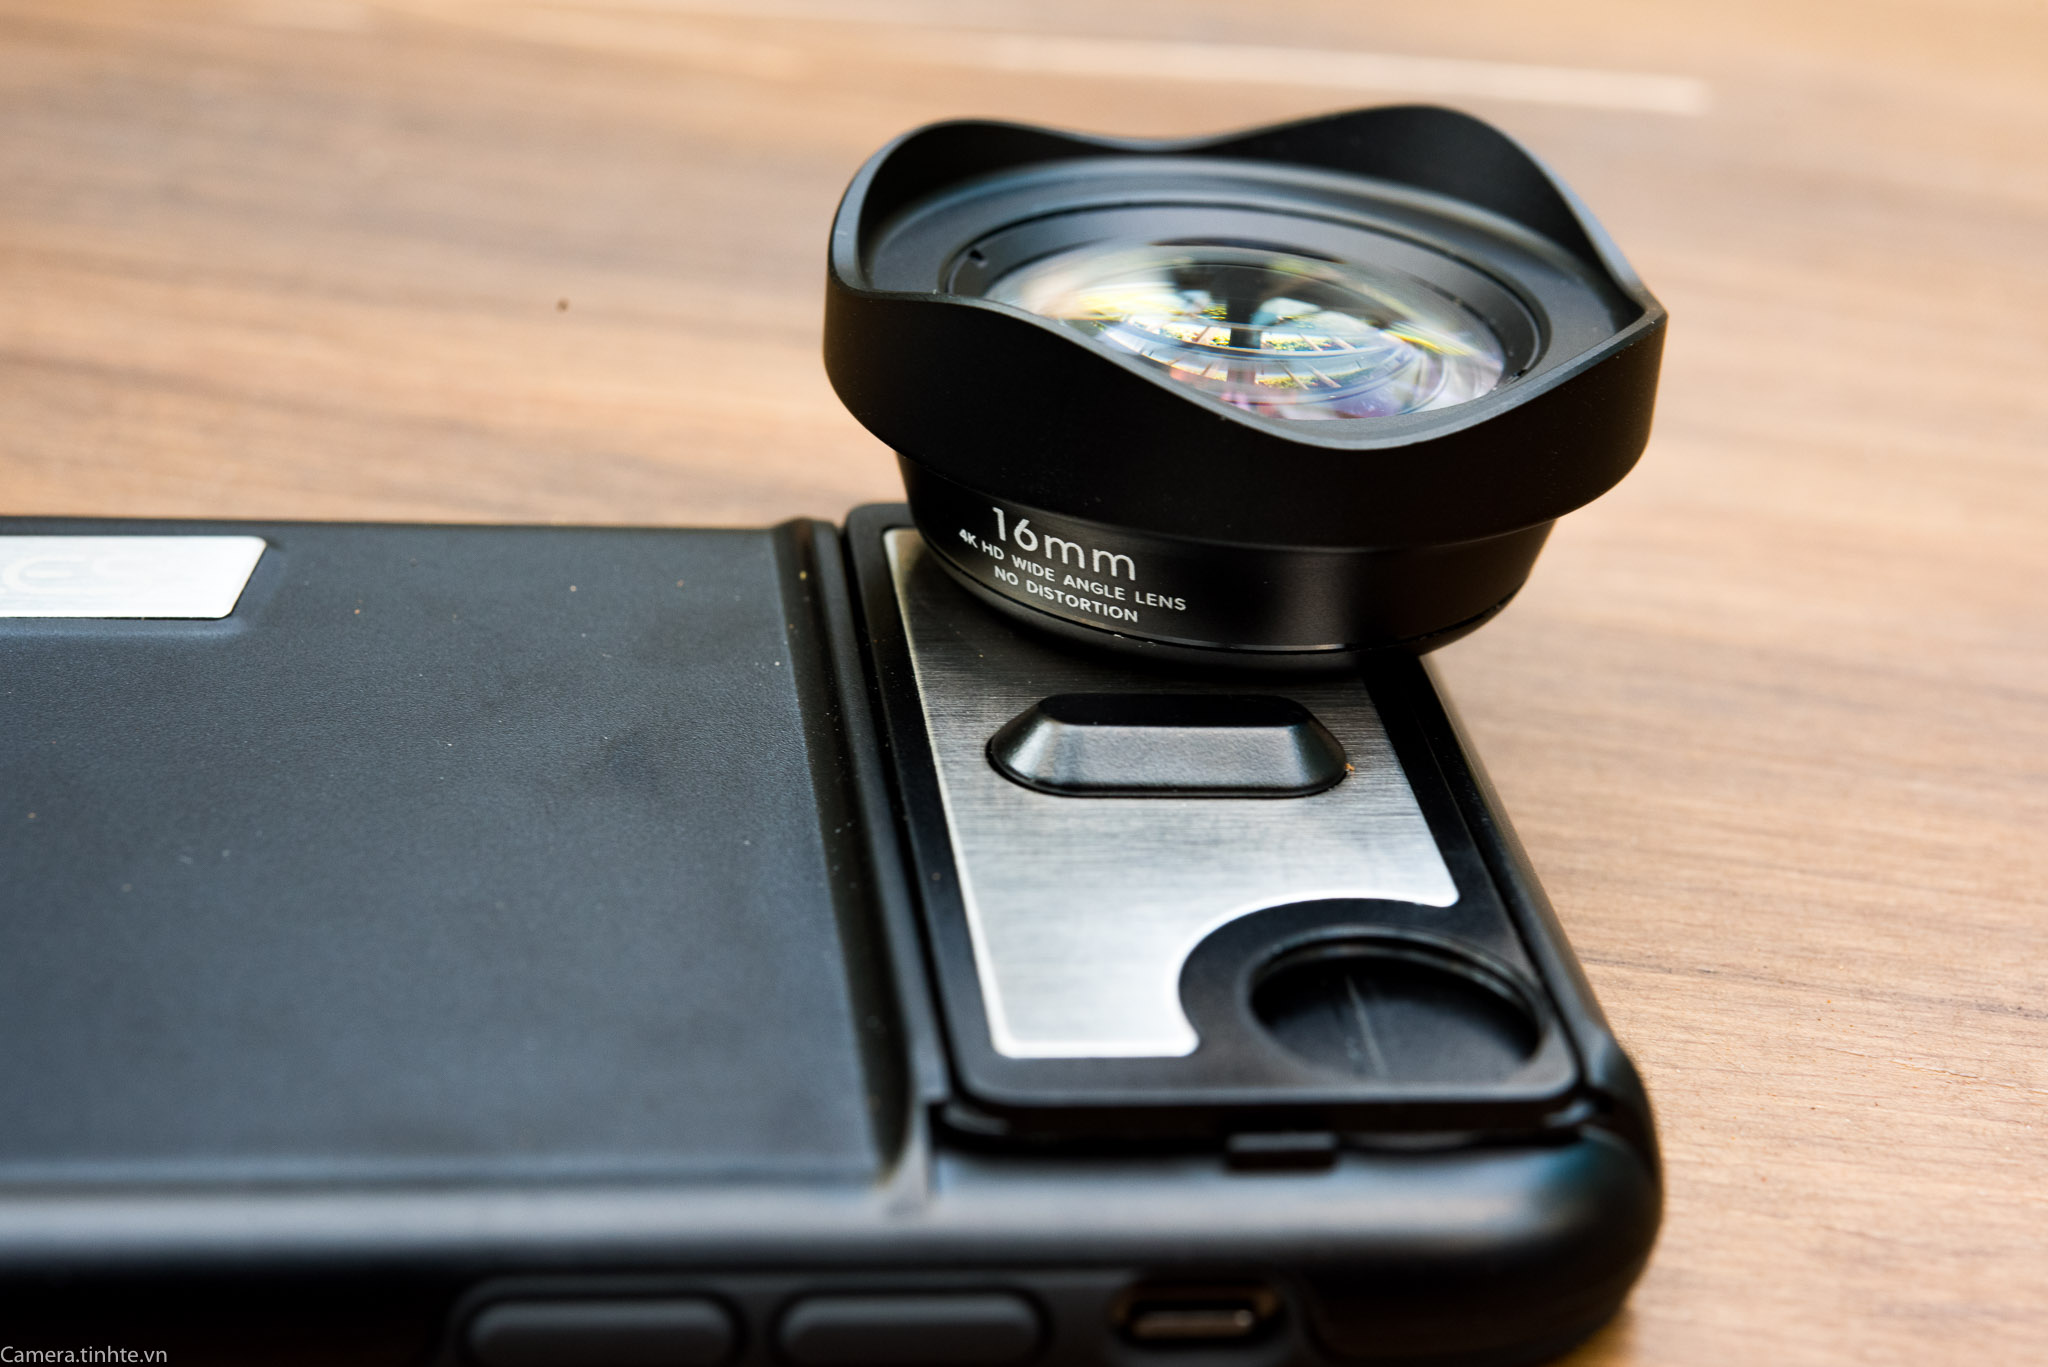 Tren tay ong kinh P-Hole lens iPhone X - Camera.tinhte.vn-12.jpg